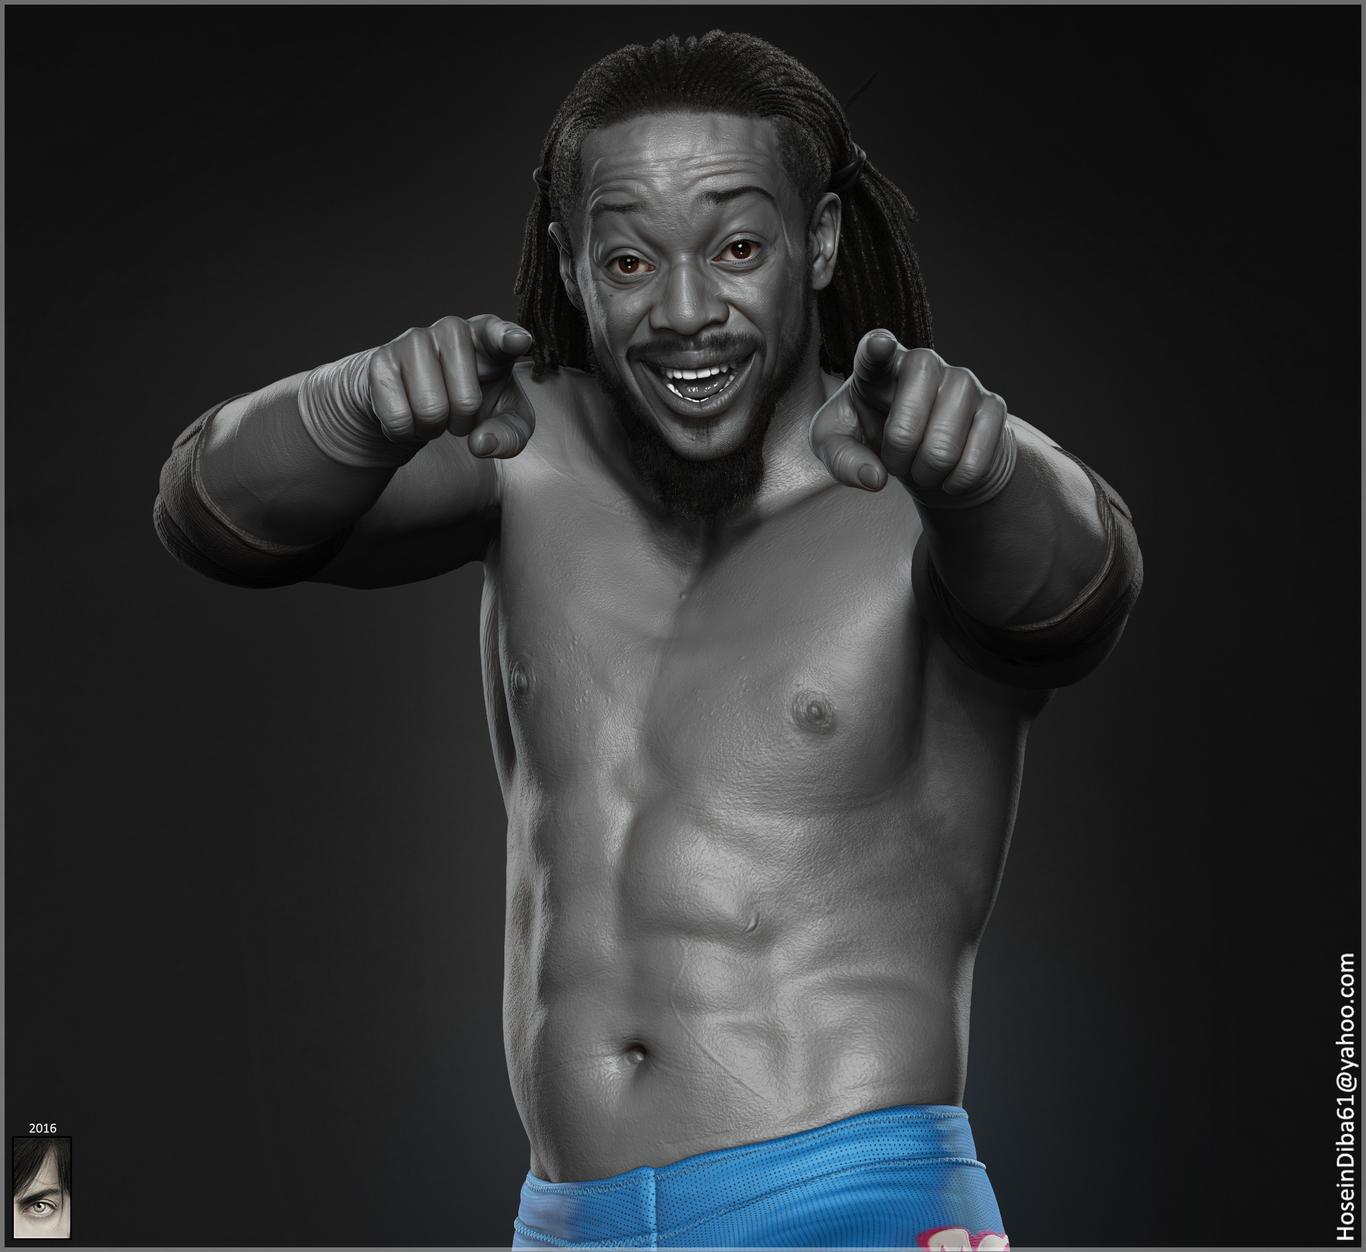 Hosseindiba kofi kingston wwe 1 2e801a80 adpc